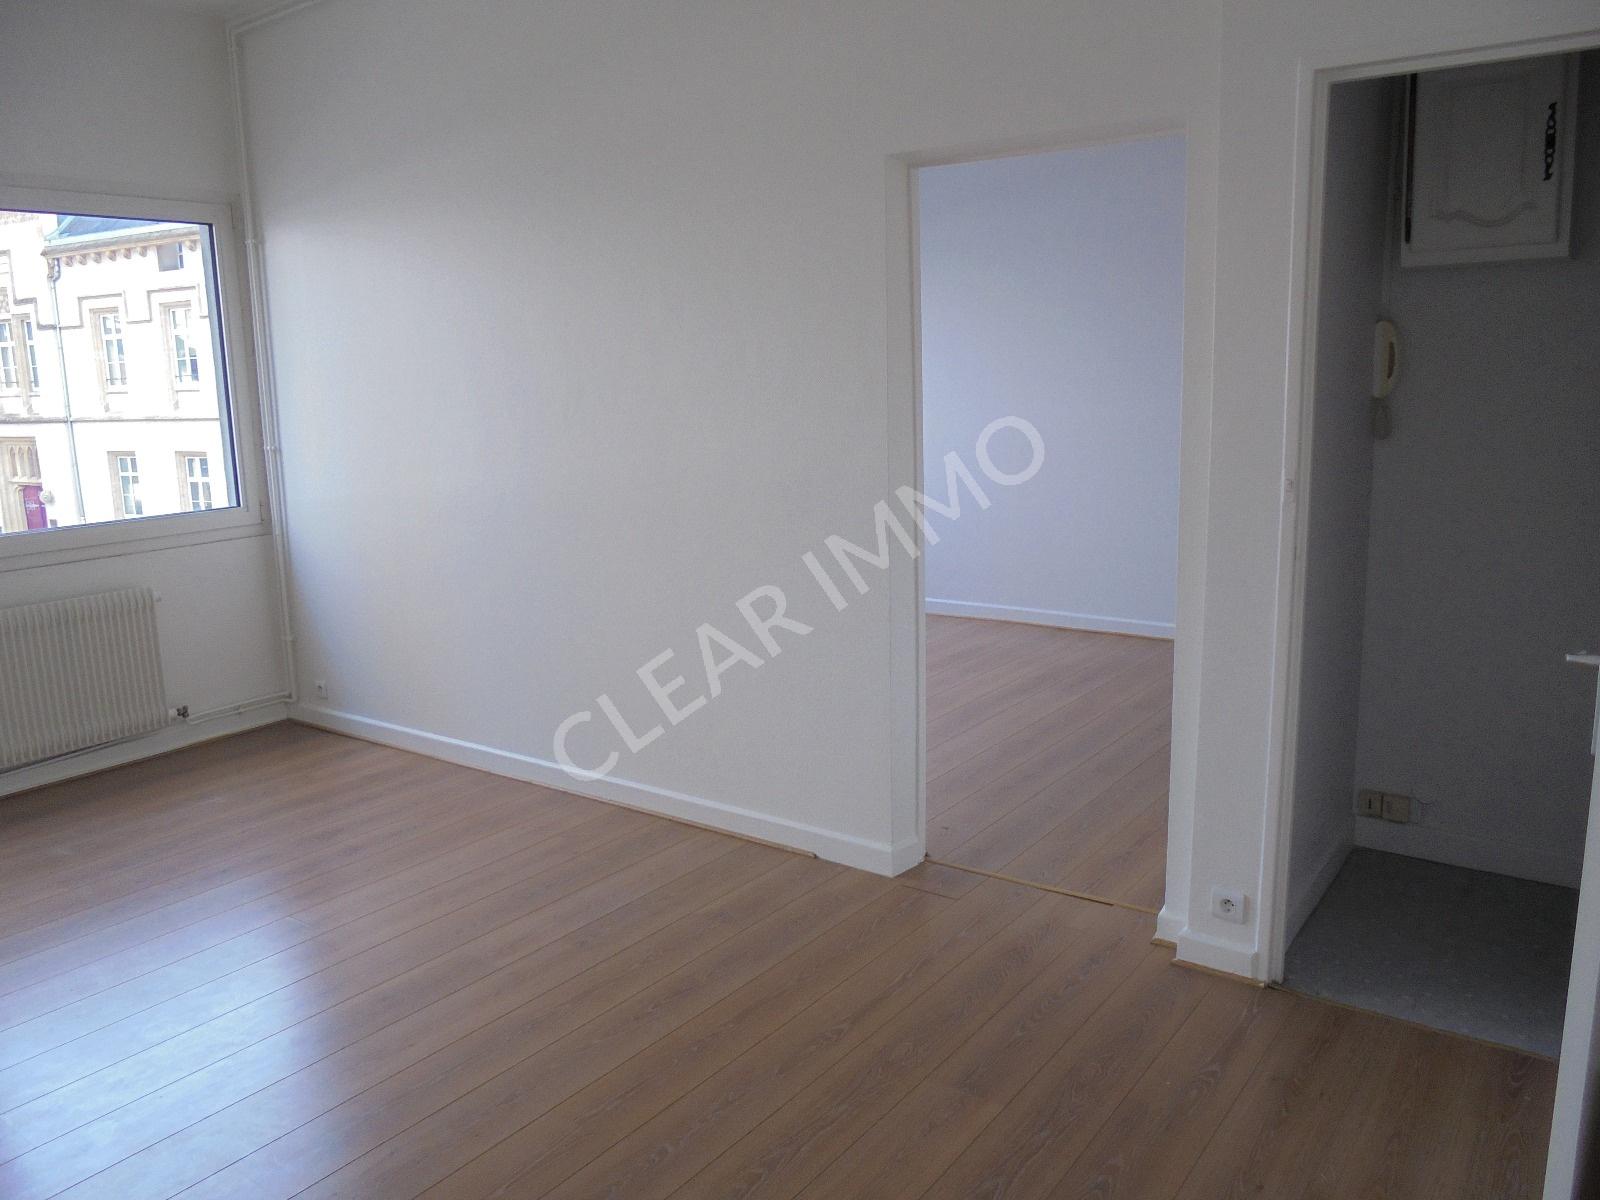 Annonce vente appartement 43 m 90 000 992738236727 for Annonce vente appartement